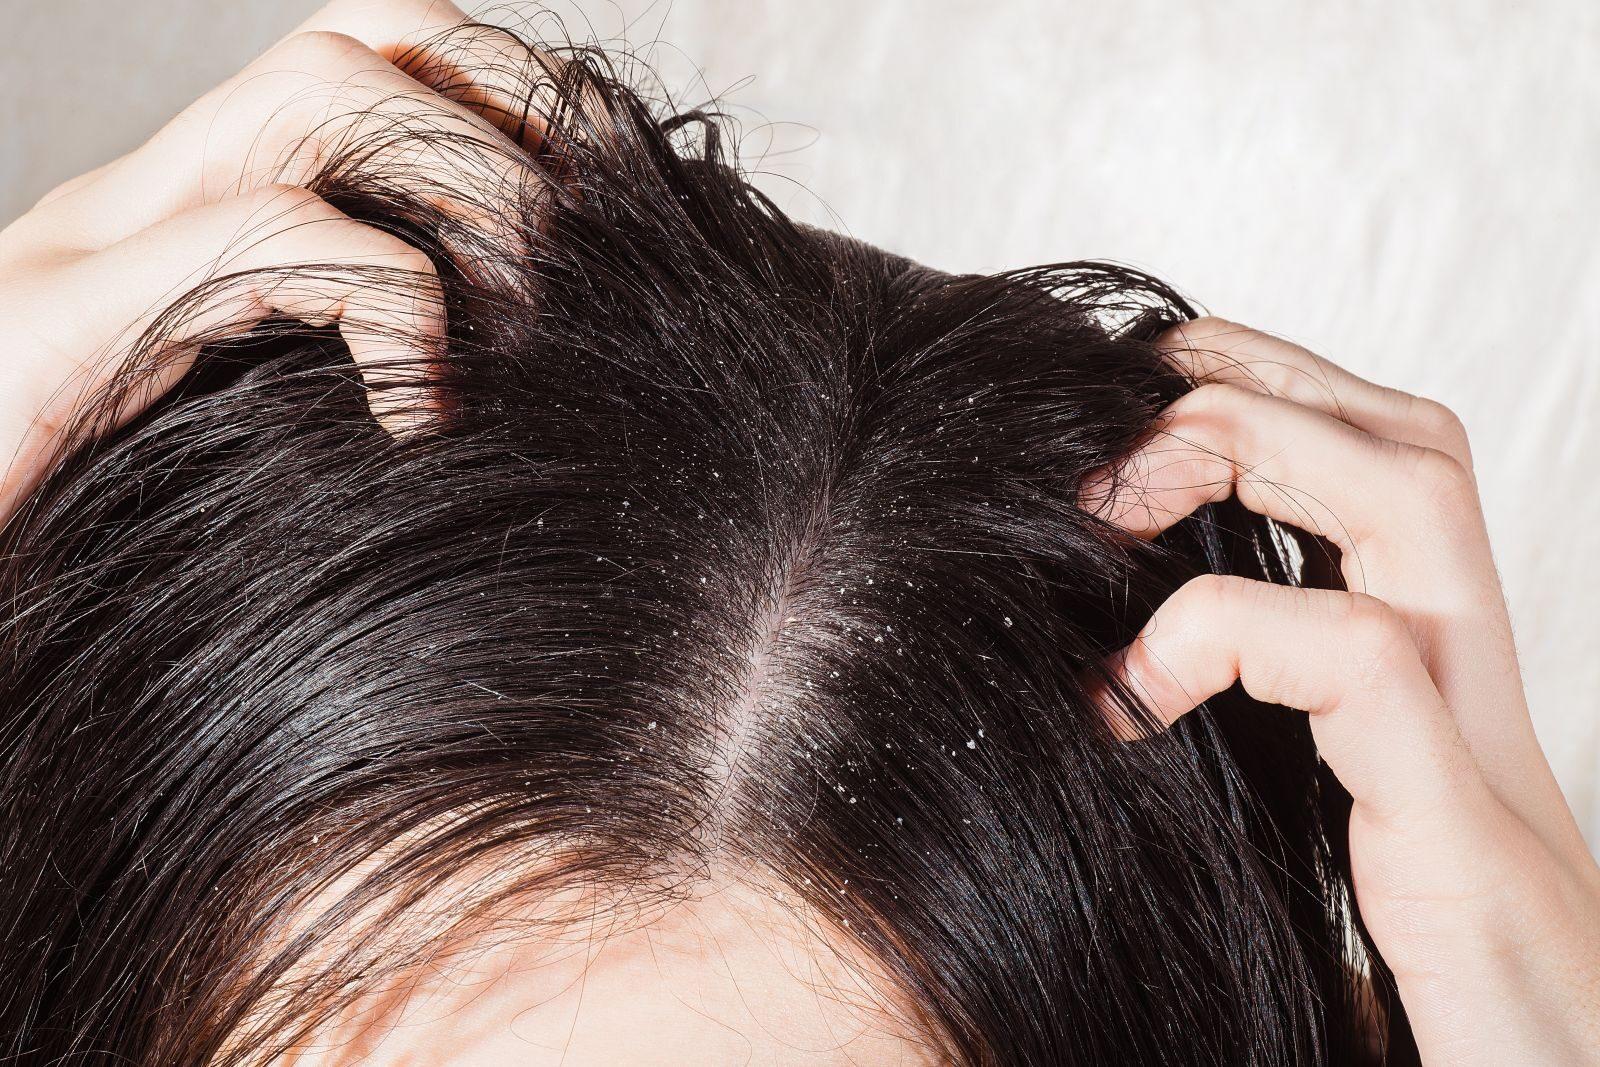 vörös folt a fejbőrön a haj alatt)